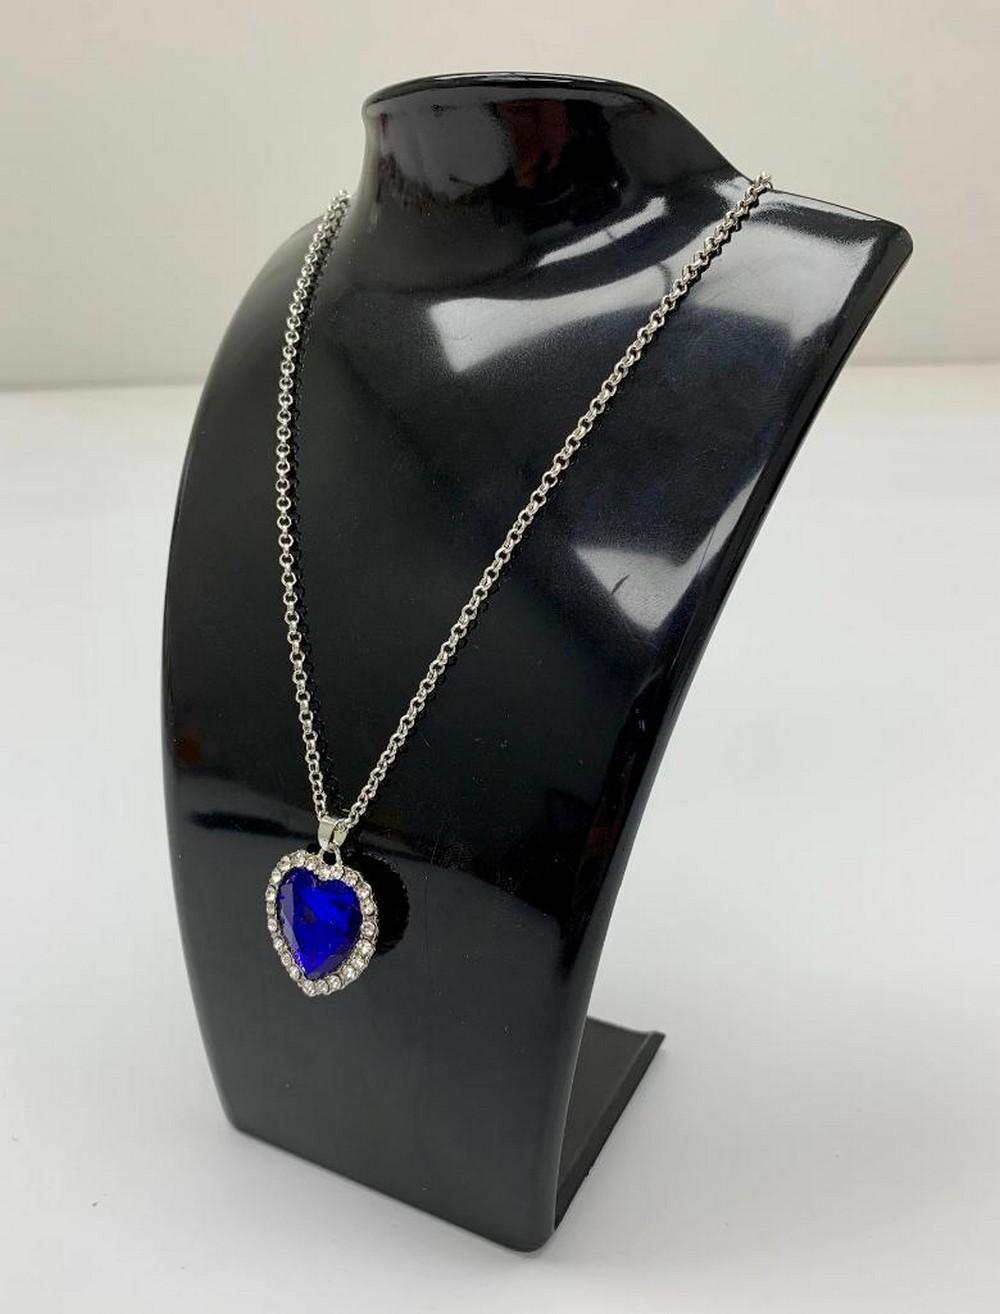 Ladies Midnight Blue Semi-precious Gemstone Heart Pendant Necklace